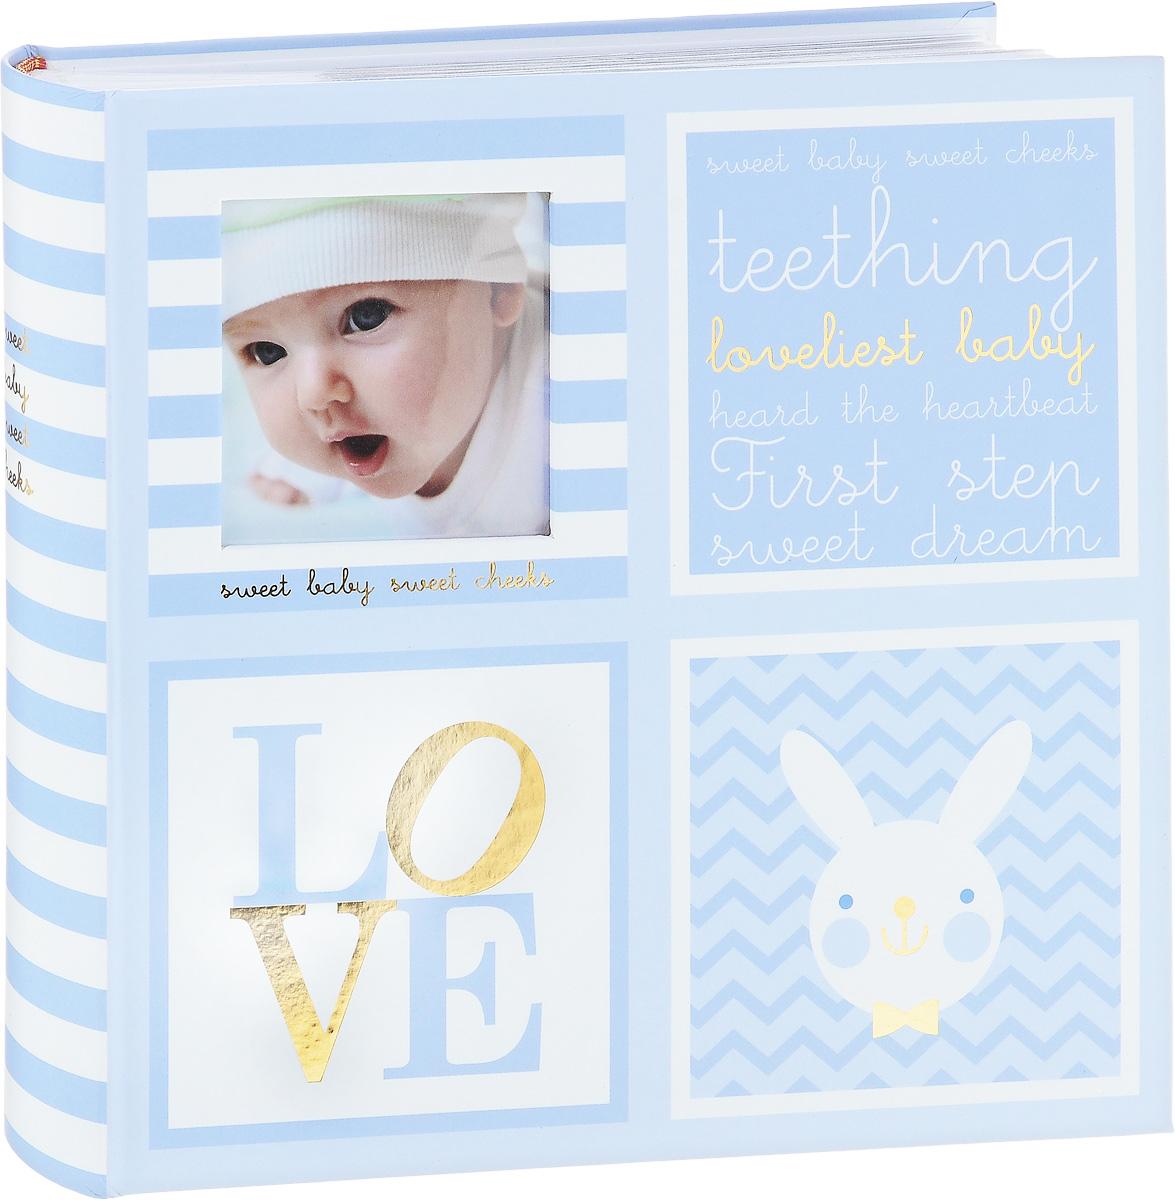 Фотоальбом Image Art Baby, 200 фотографий, 10 x 15 см, цвет: голубой. BBM46200/2/026 аксессуар image art 4004 7 passe partout c0035189